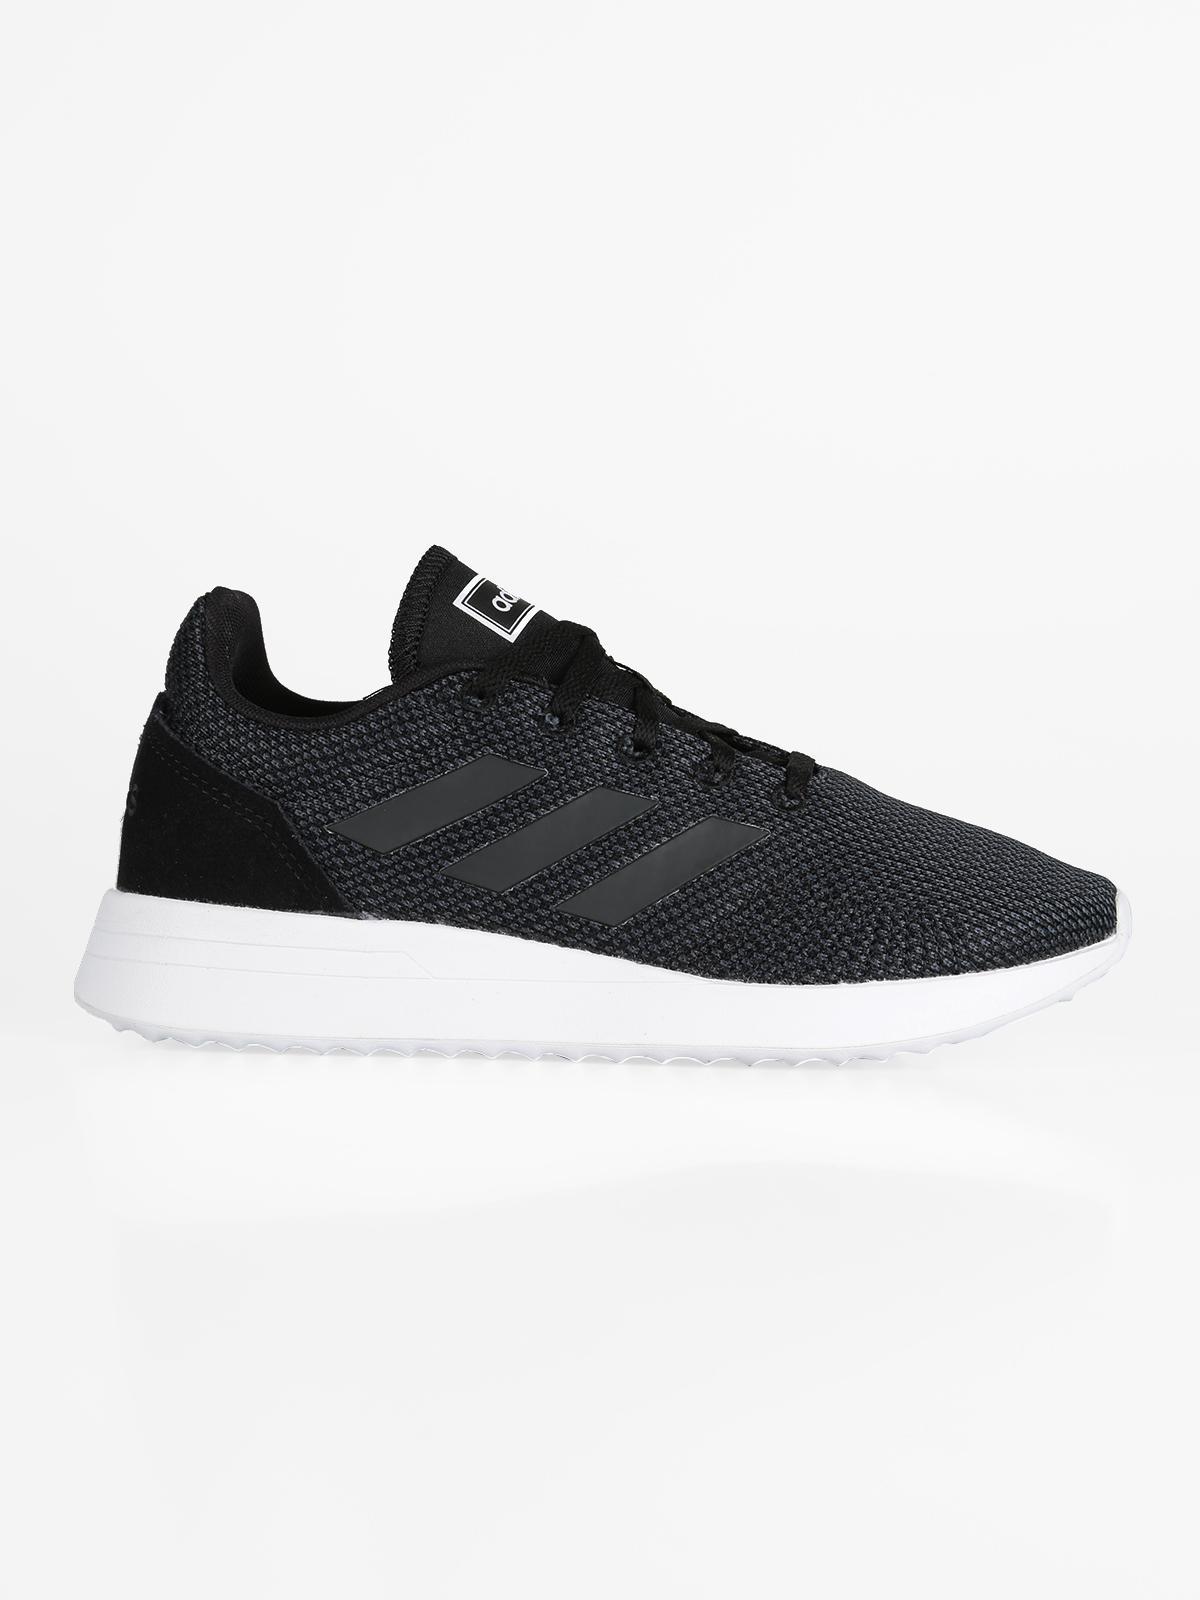 Run70s Scarpe running nere adidas   MecShopping